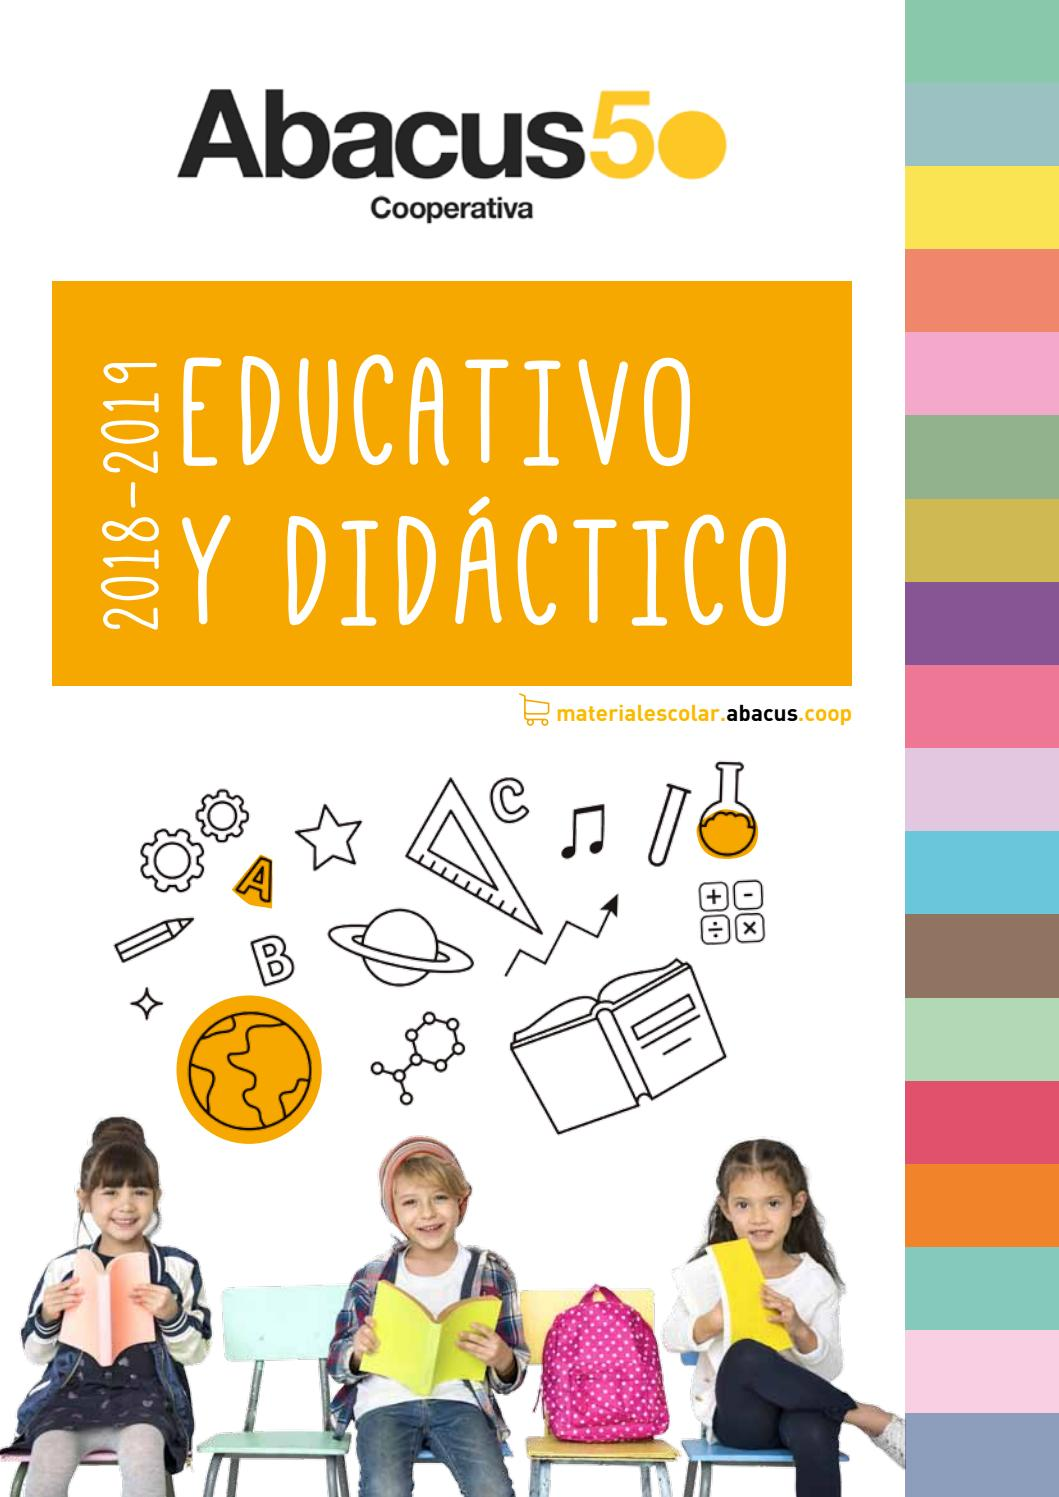 f1d1ed8a2 Catálogo Abacus educativo 2018 castellano by Abacus cooperativa - issuu